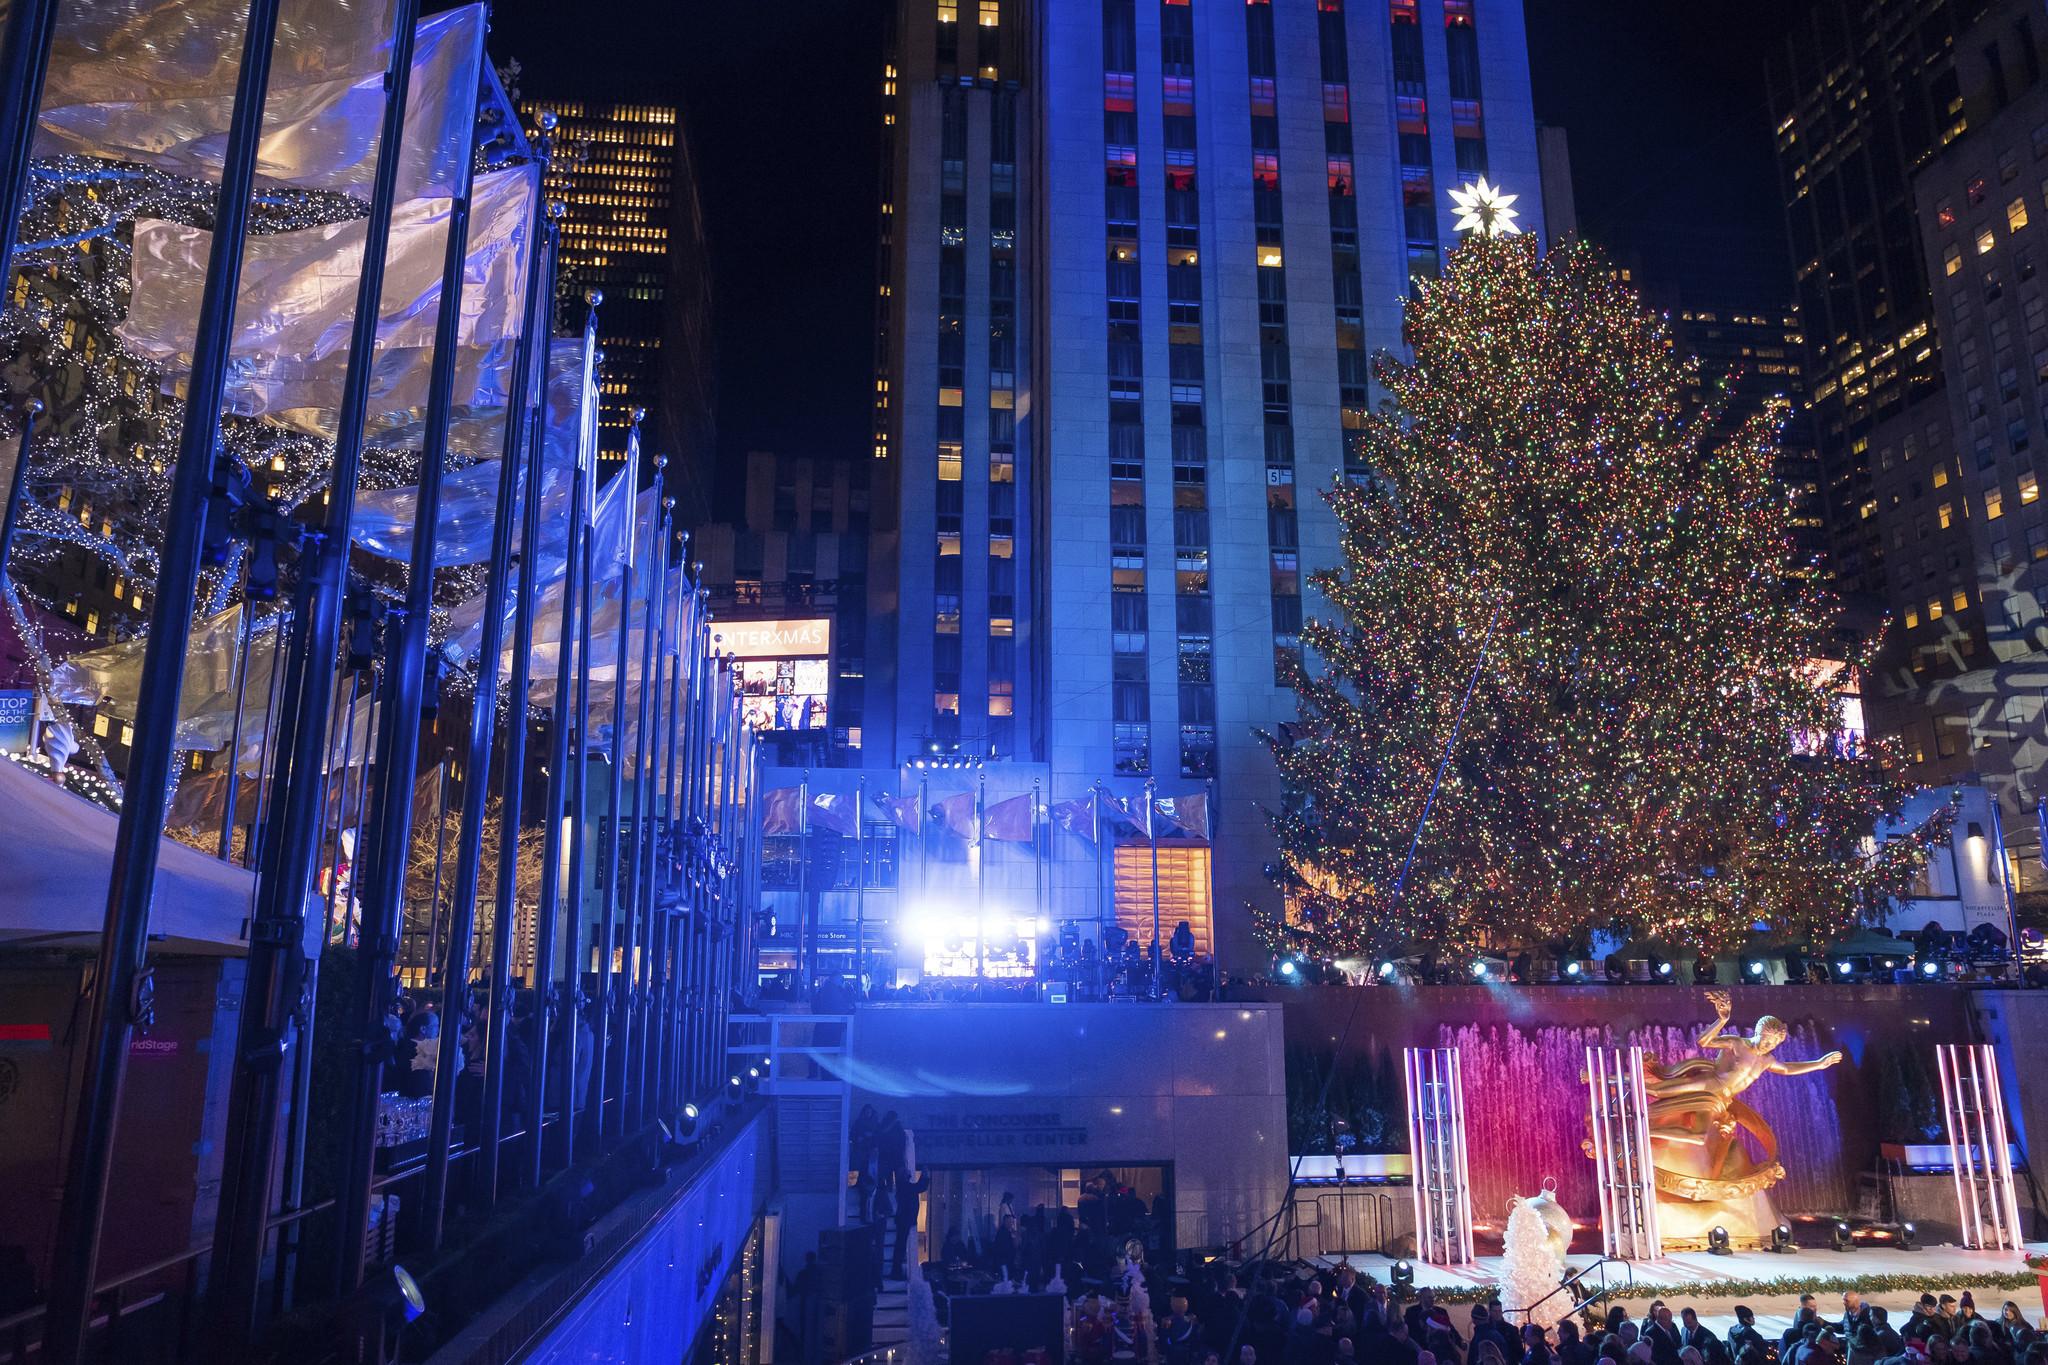 PICTURES: Rockefeller Center Christmas Tree Lighting